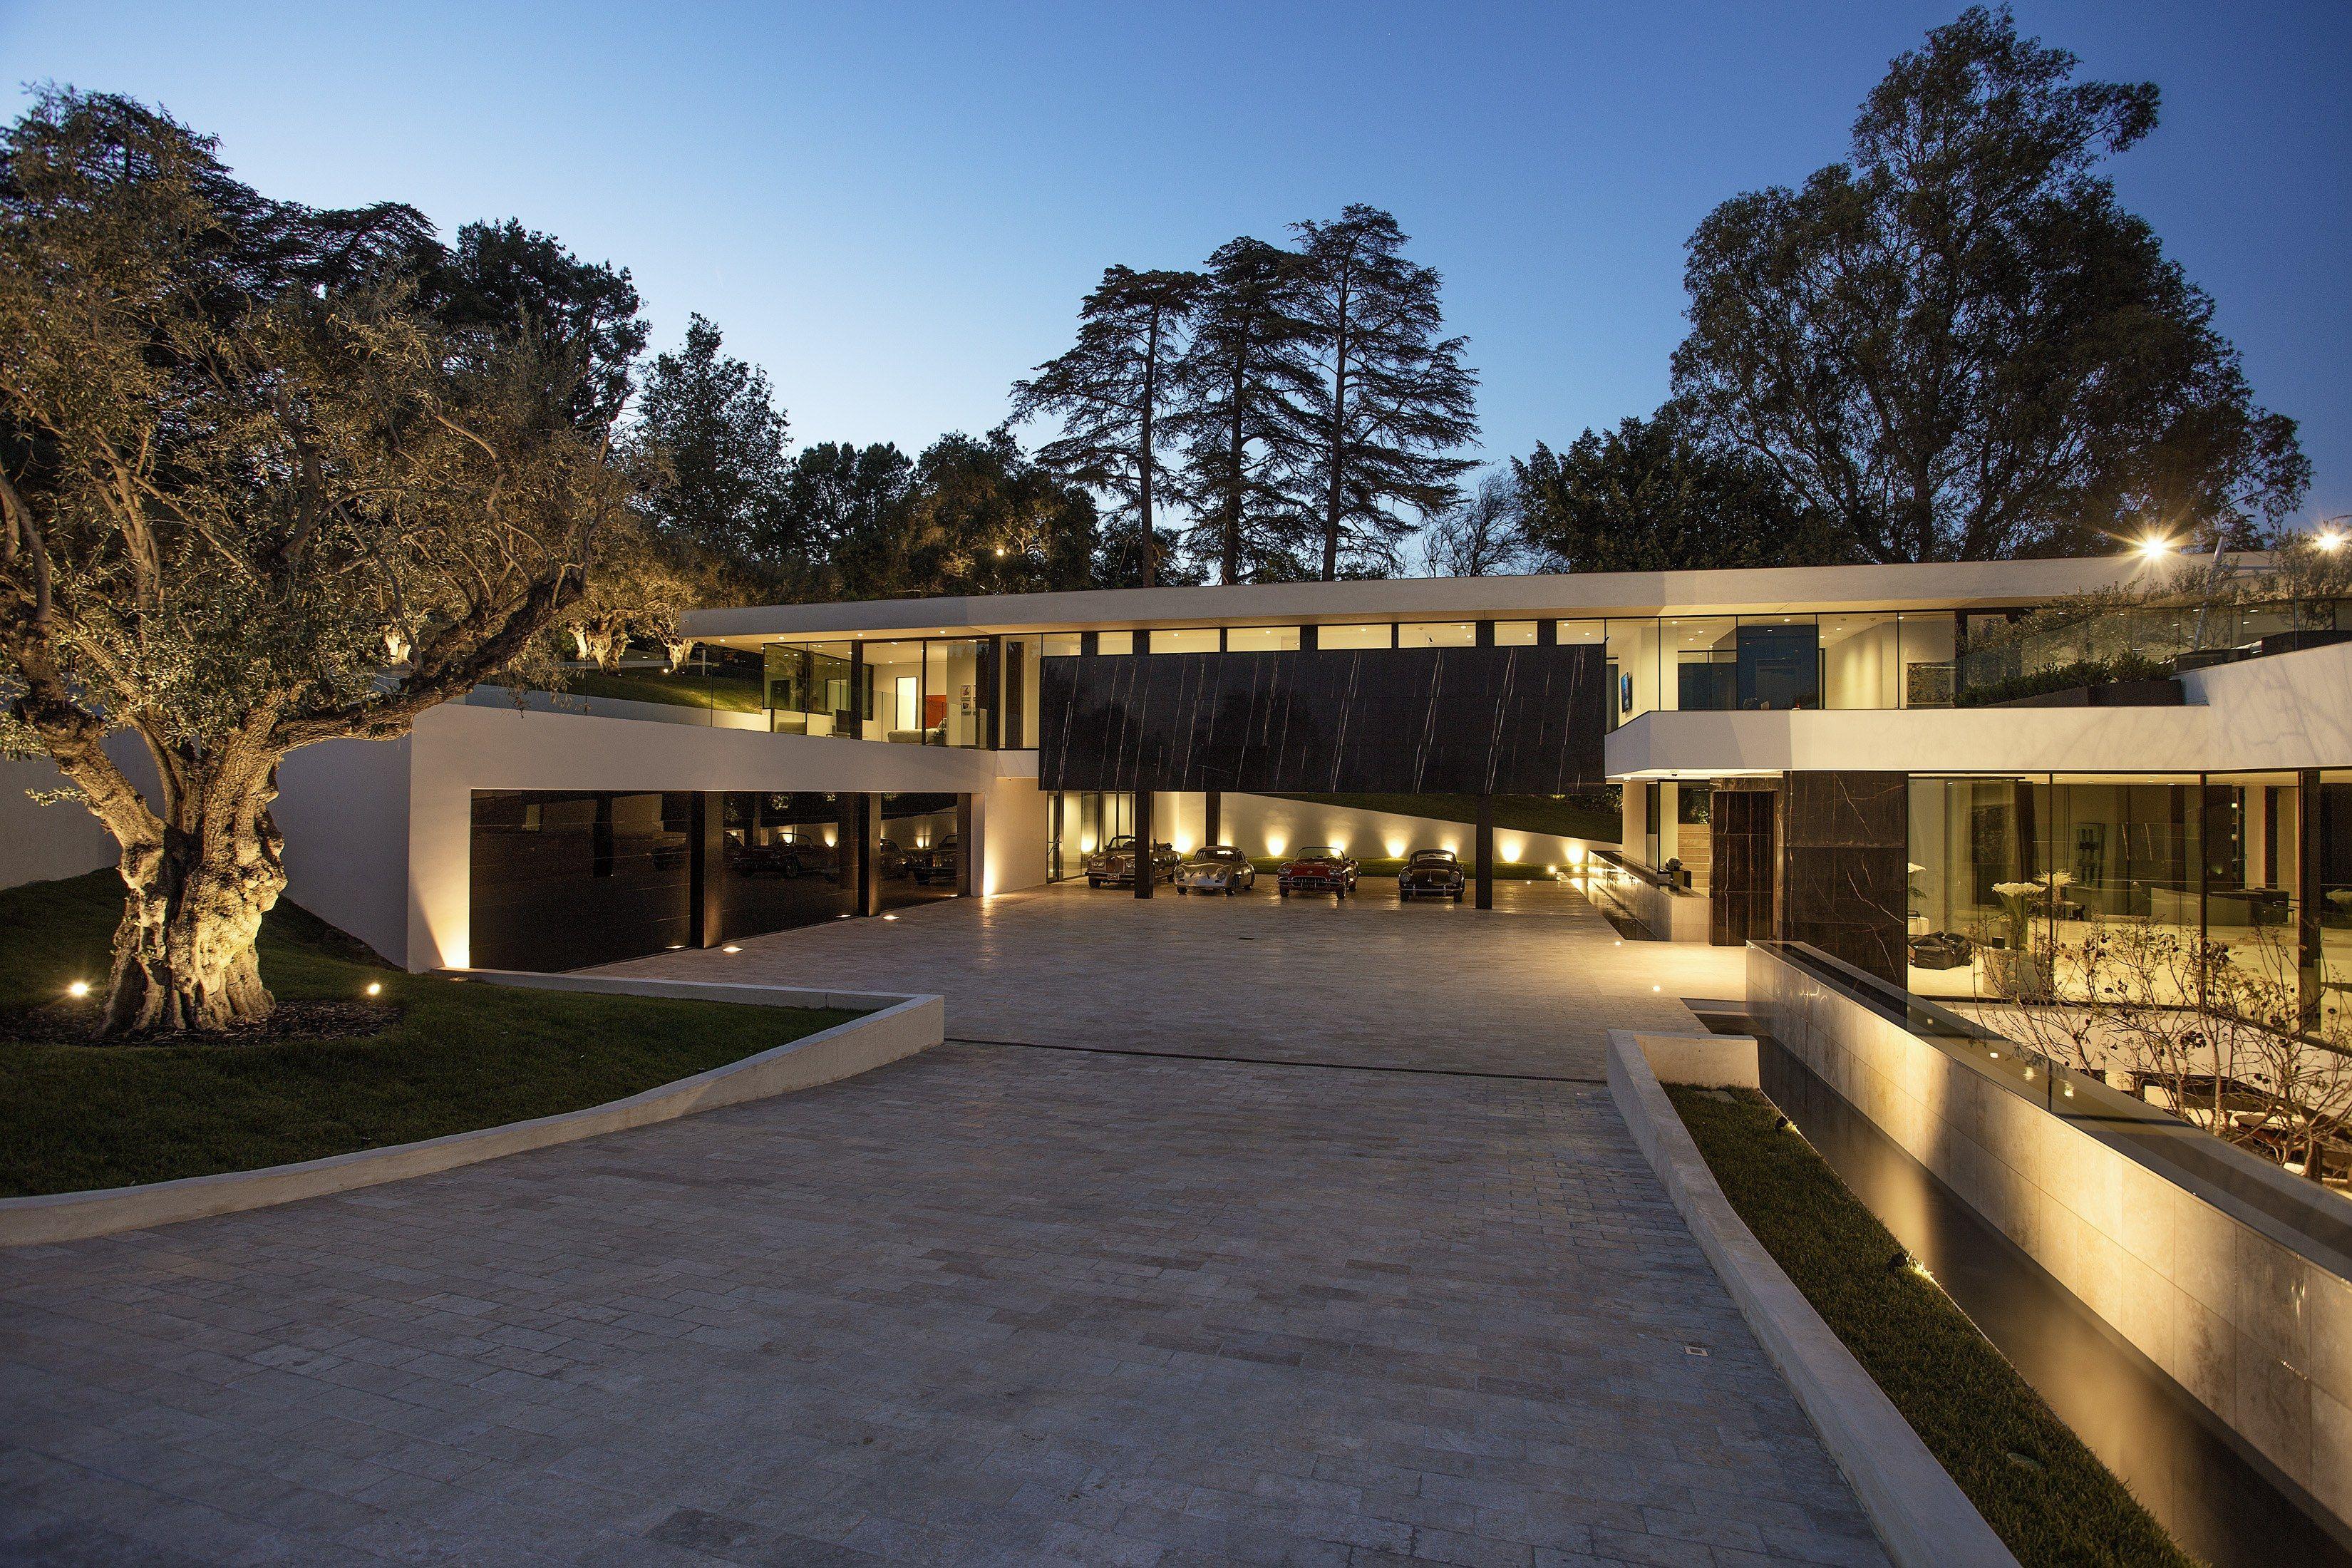 Inside the Giga-Mansions of Beyoncé and Jay-Z, Calvin Klein, Avicii ...